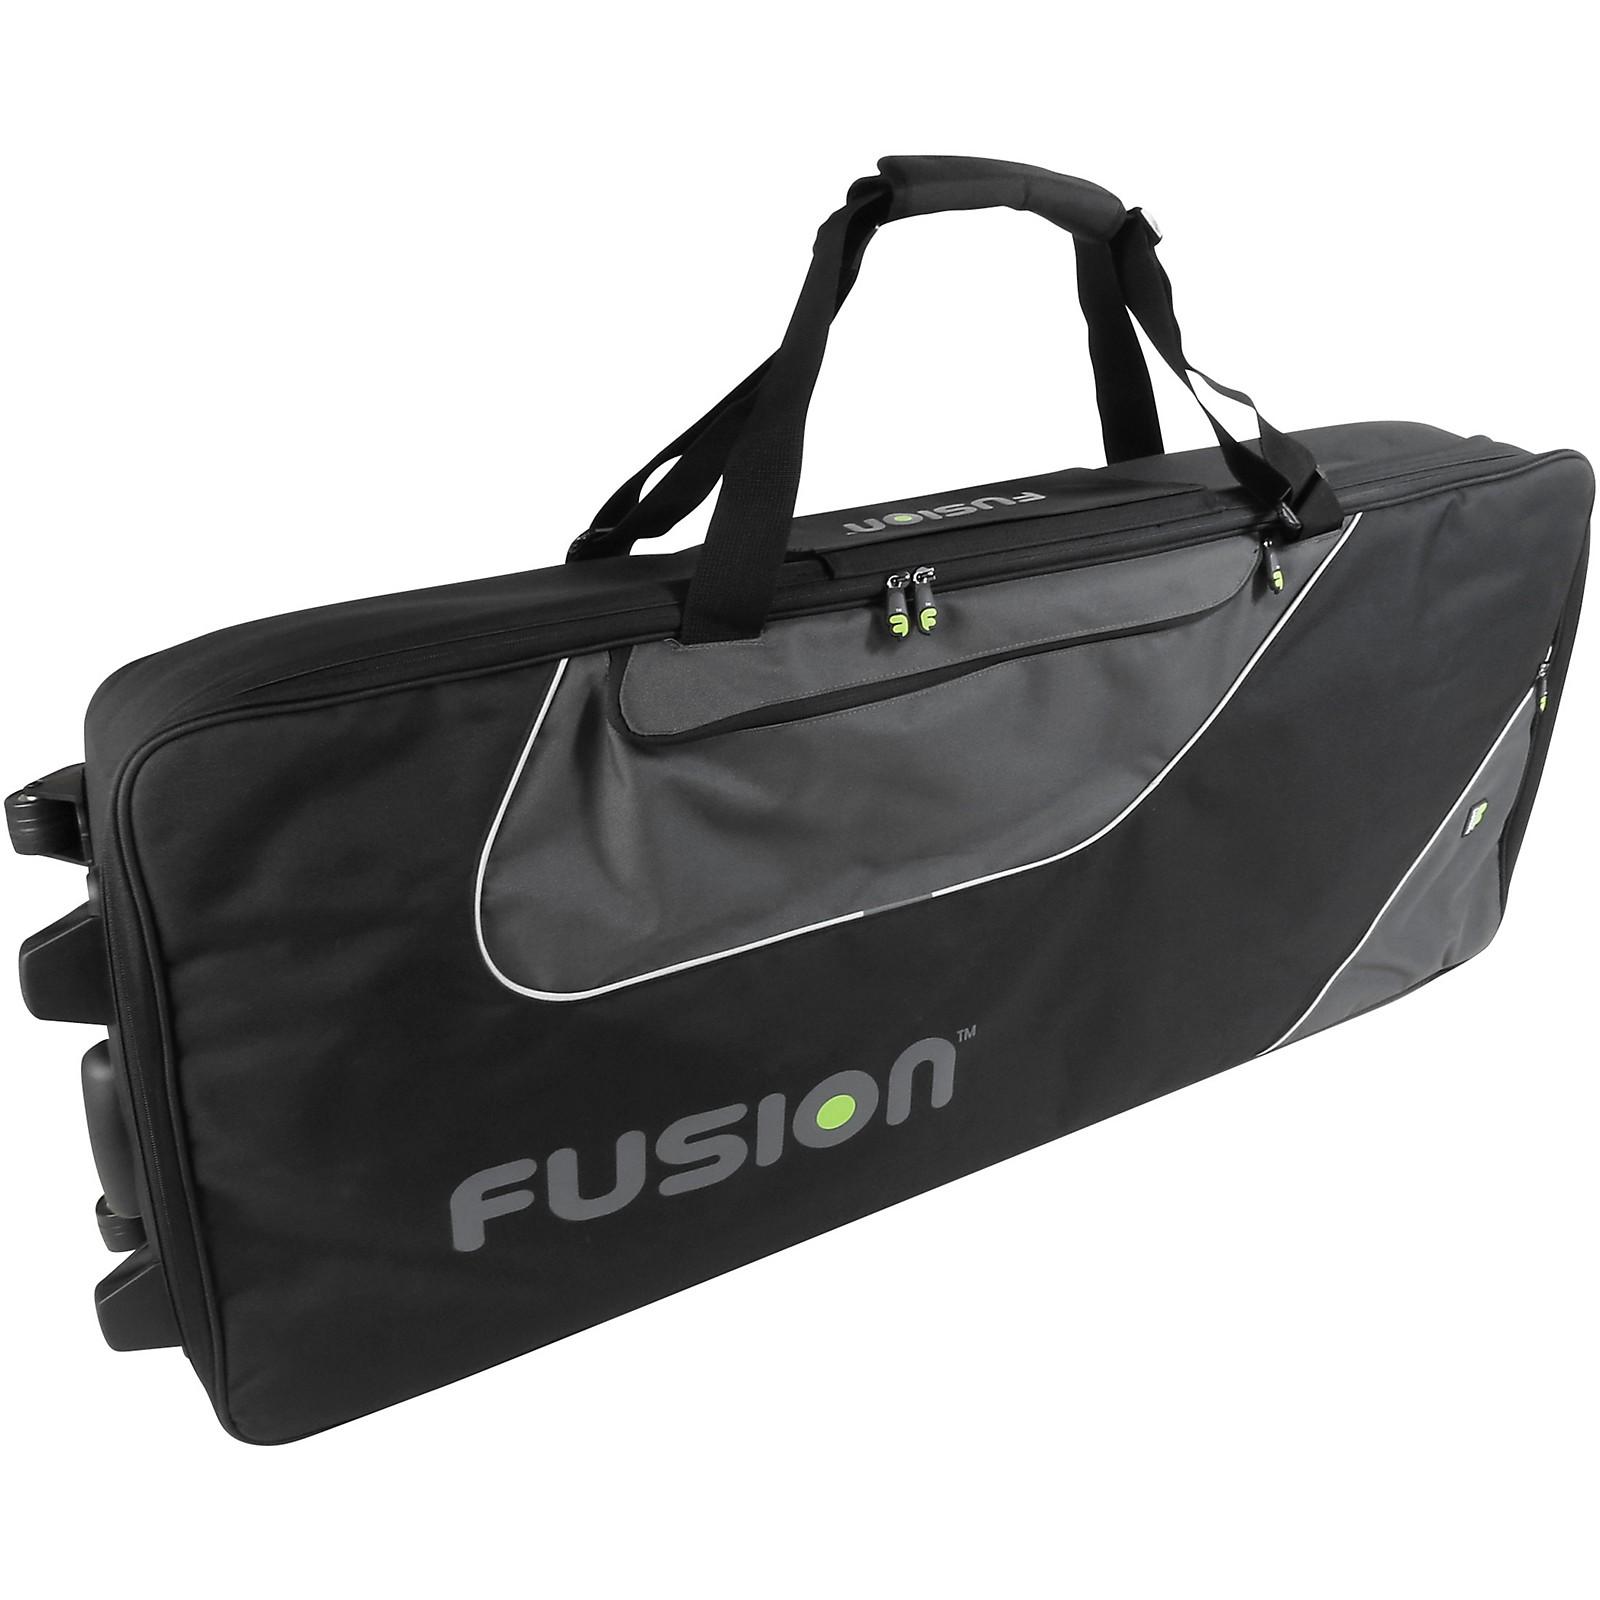 Open Box Fusion Keyboard 16 Gig Bag with Wheels (76-88 Keys)